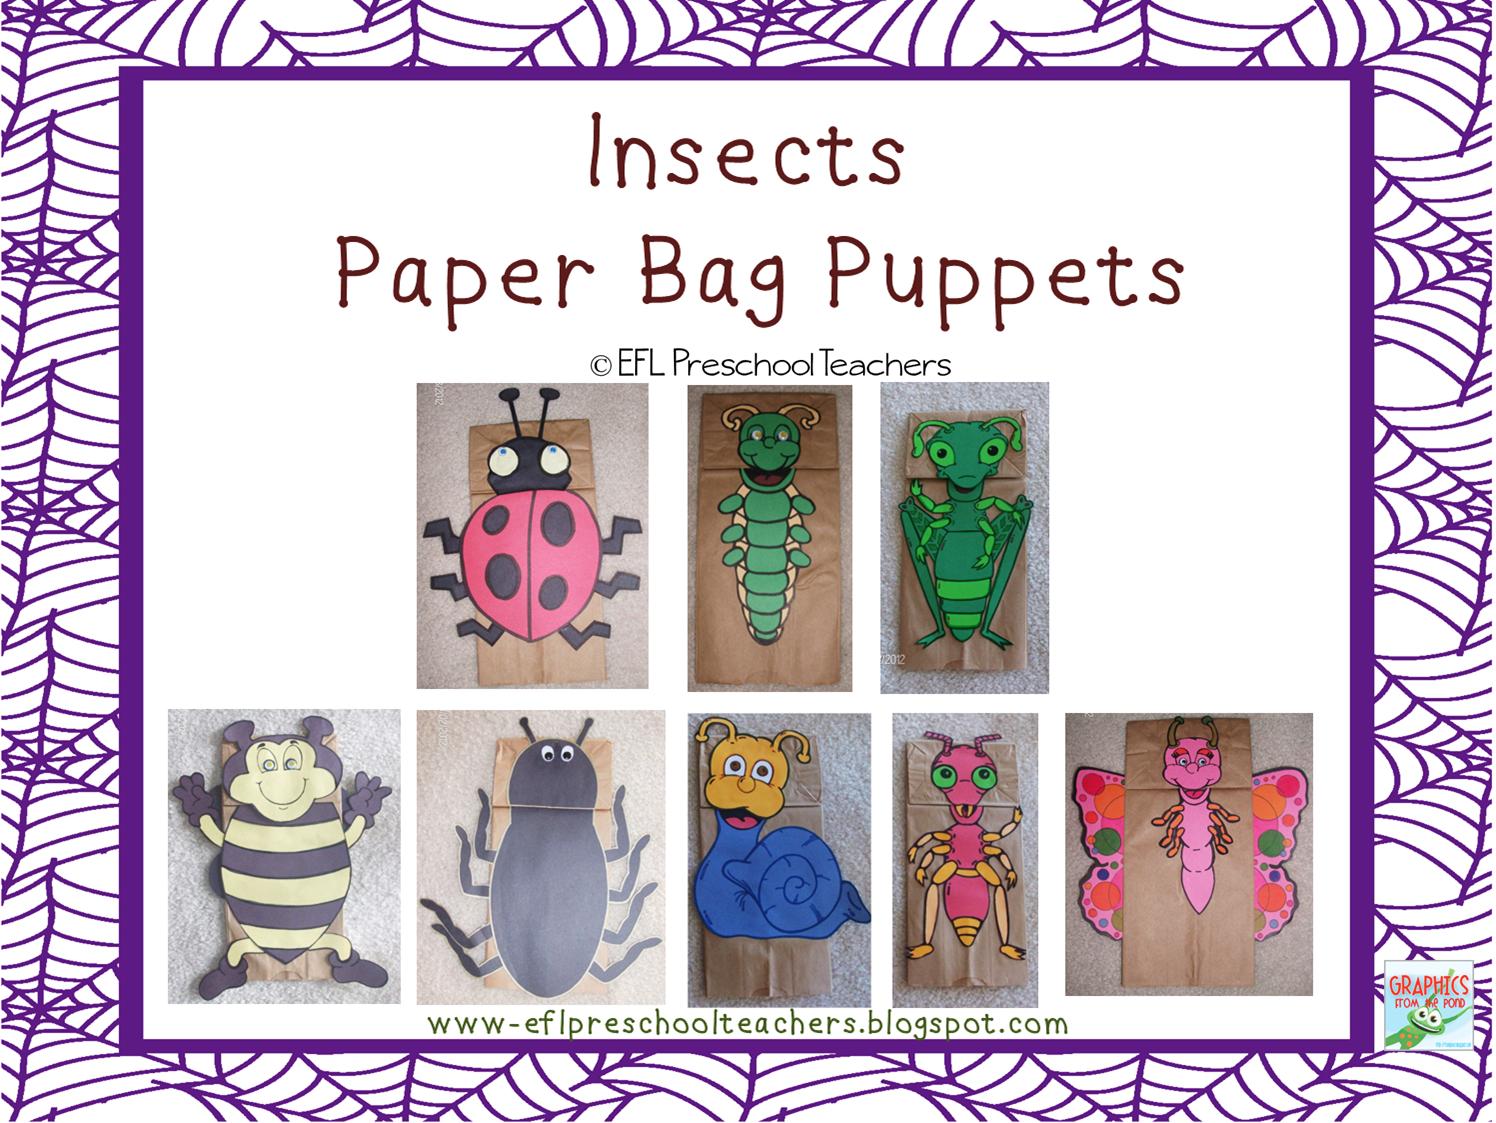 Esl Efl Preschool Teachers Insects